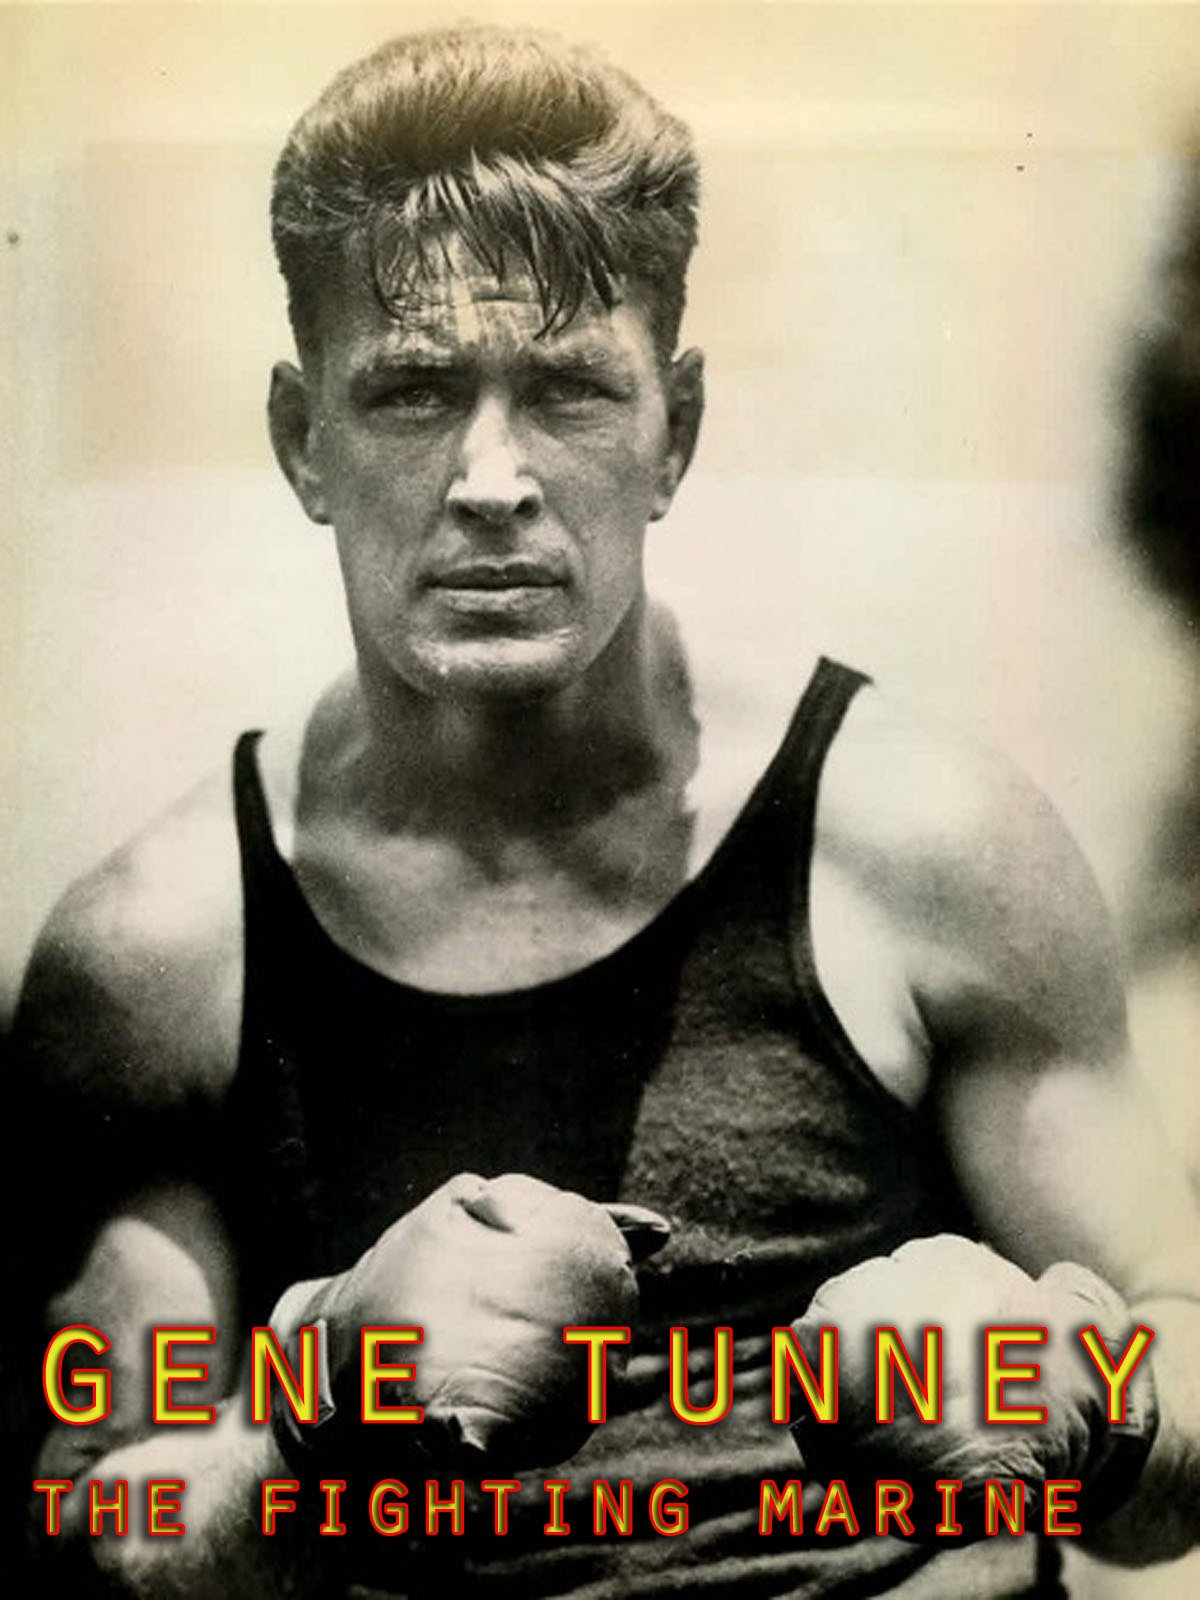 Gene Tunney : The Fighting Marine